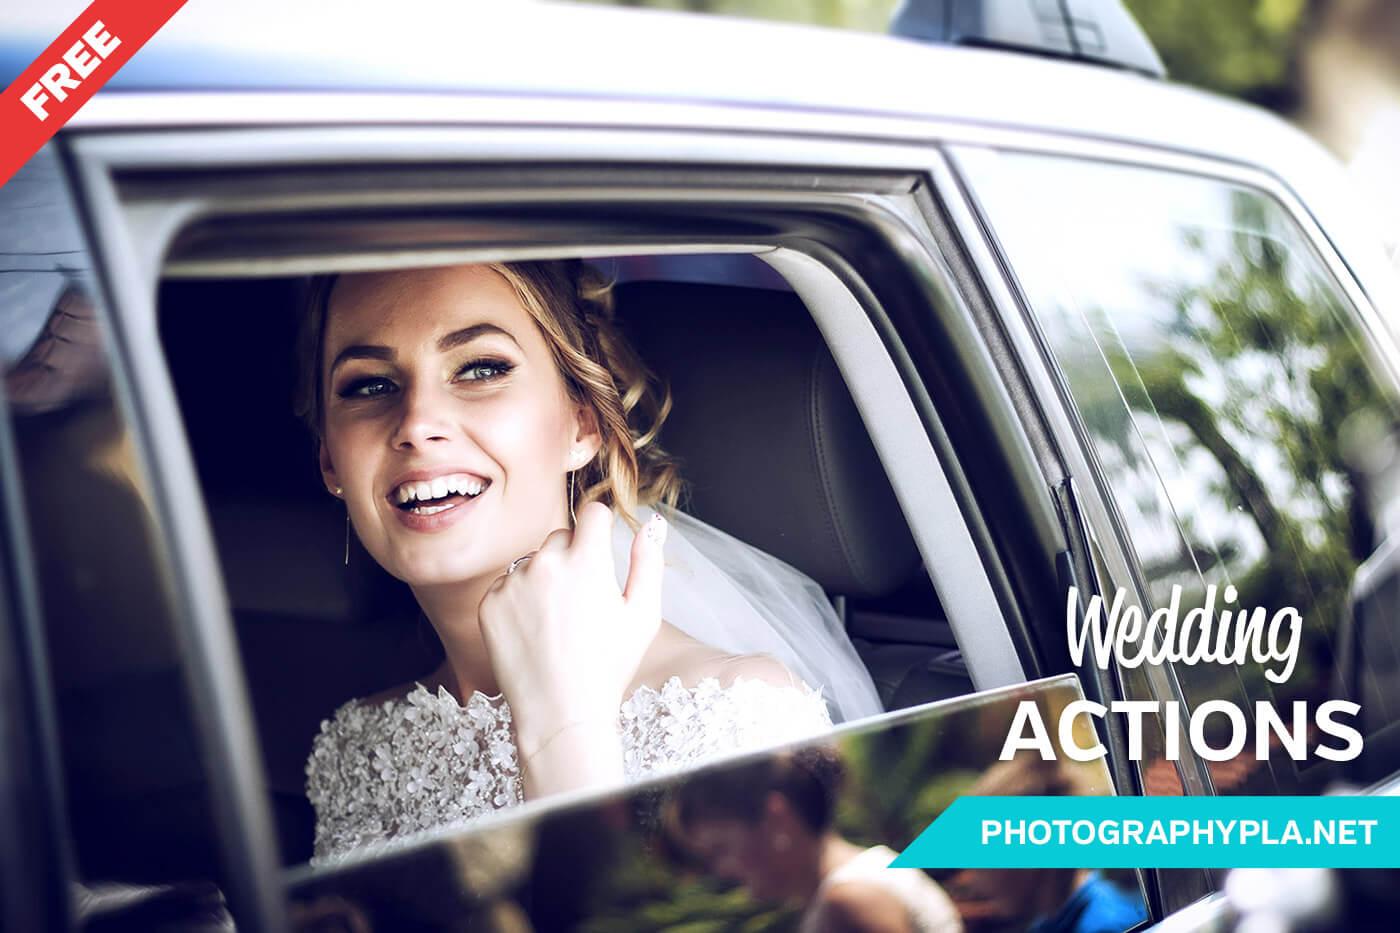 Amazing Free-Photoshop-Wedding-Actions